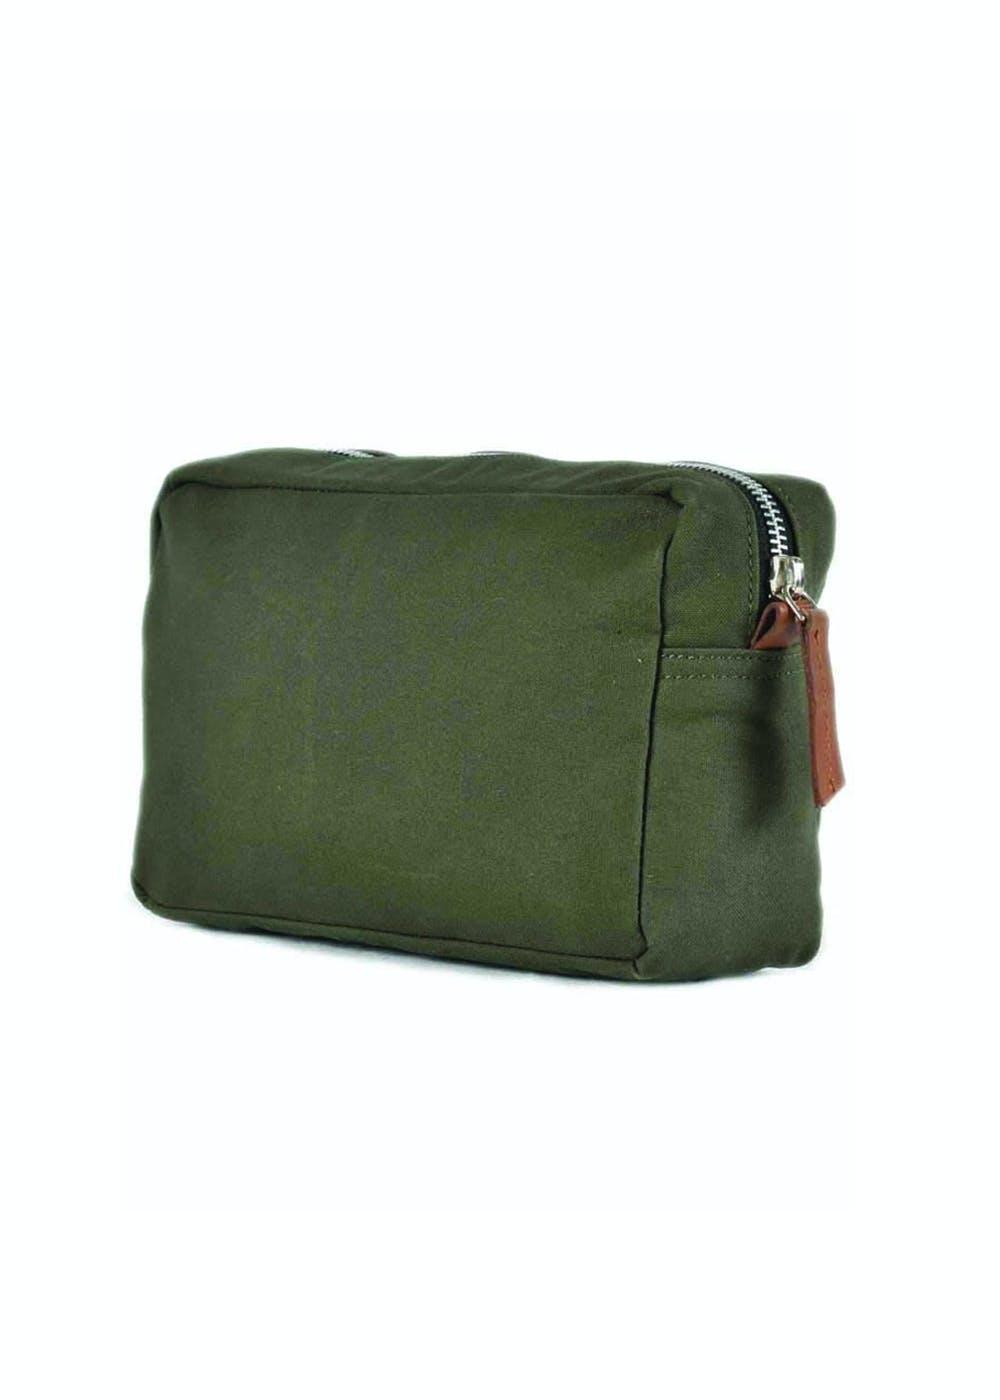 Canvas Zipper Olive Green Toiletry Bag